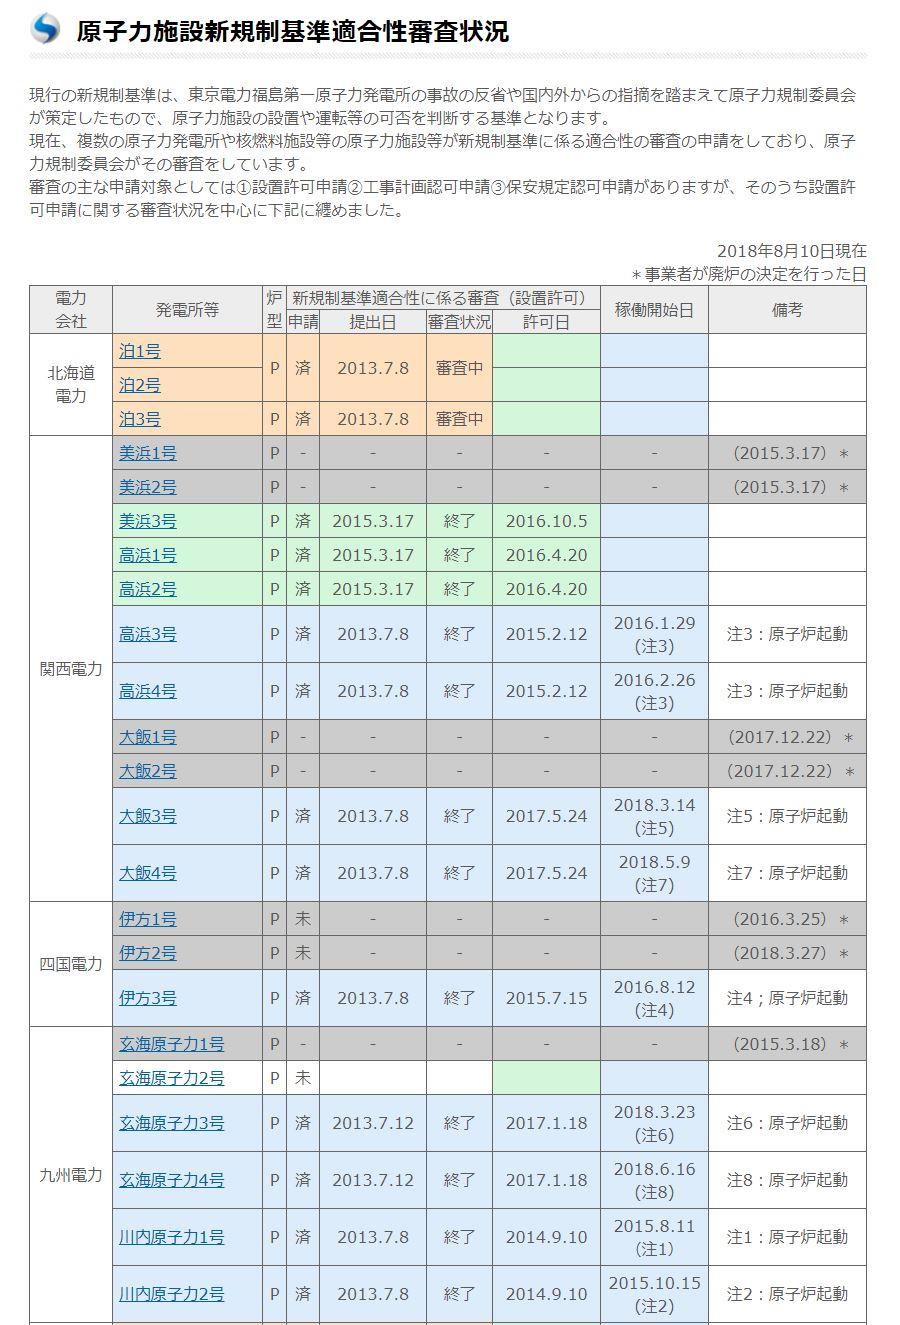 article43-8-1 shinsei.JPG